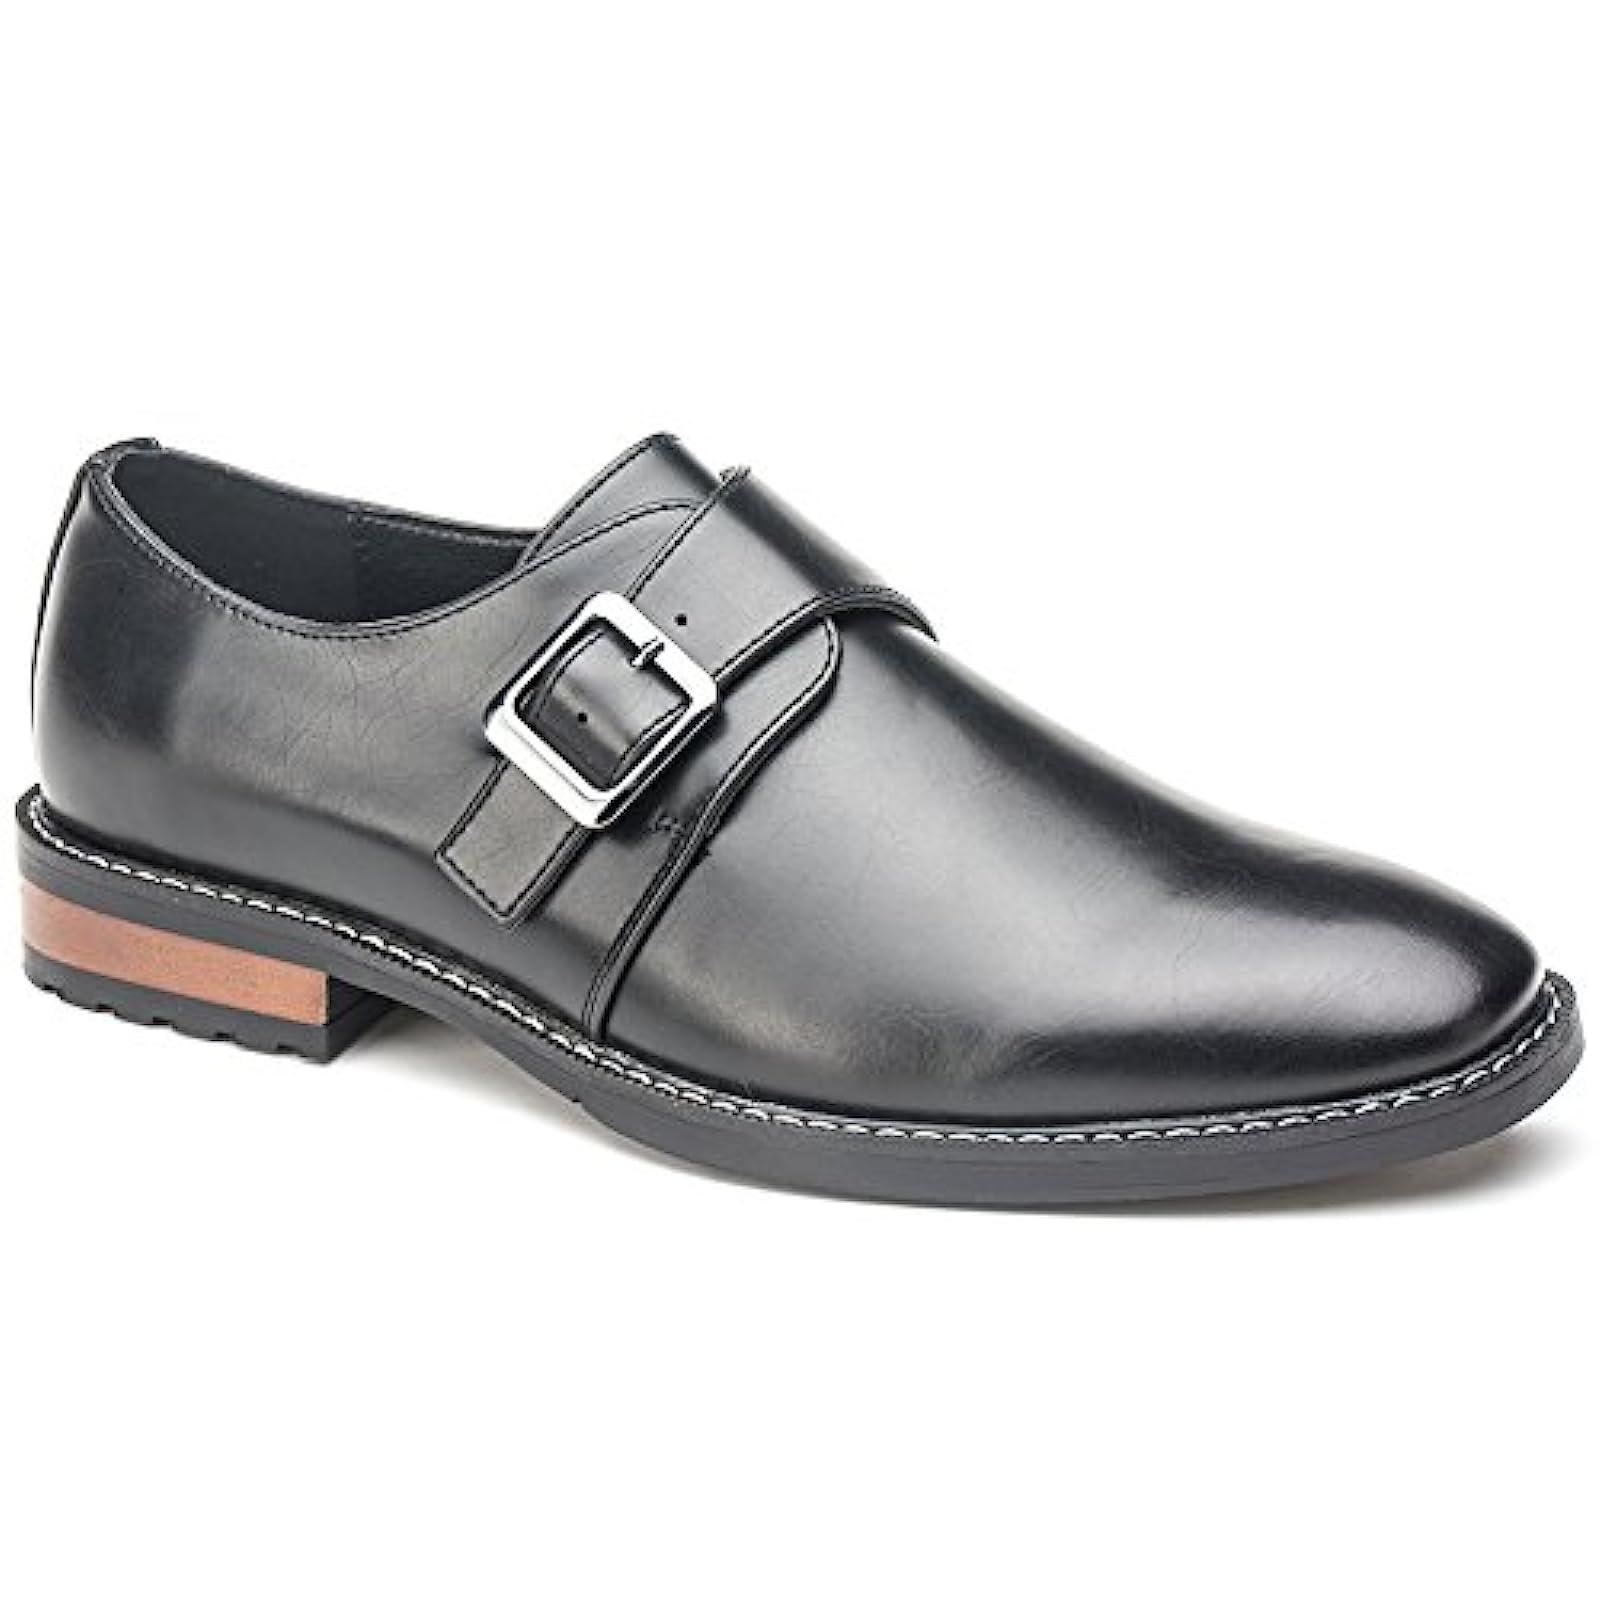 US,Black Mens Dress Shoes Monk Strap Buckle Loafers Slip on Oxford Shoes 10.5 D,M